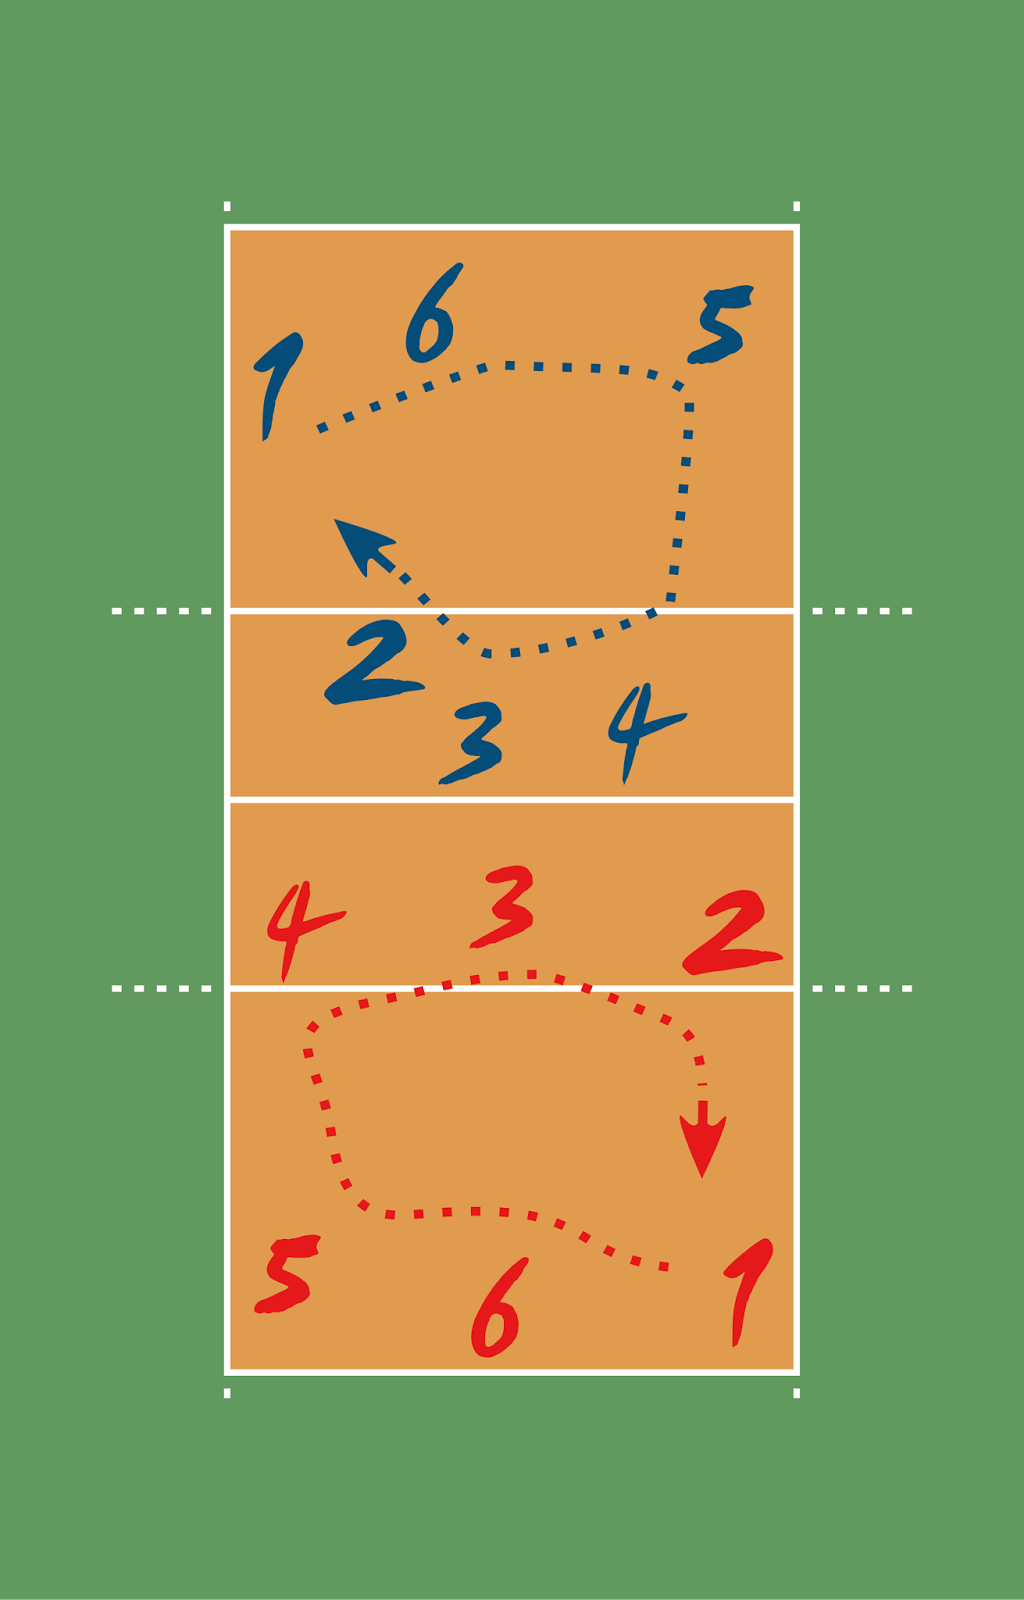 Pemain Bola Voli Dan Tugasnya : pemain, tugasnya, Posisi, Pemain, Berikut, Fungsi, Tugasnya